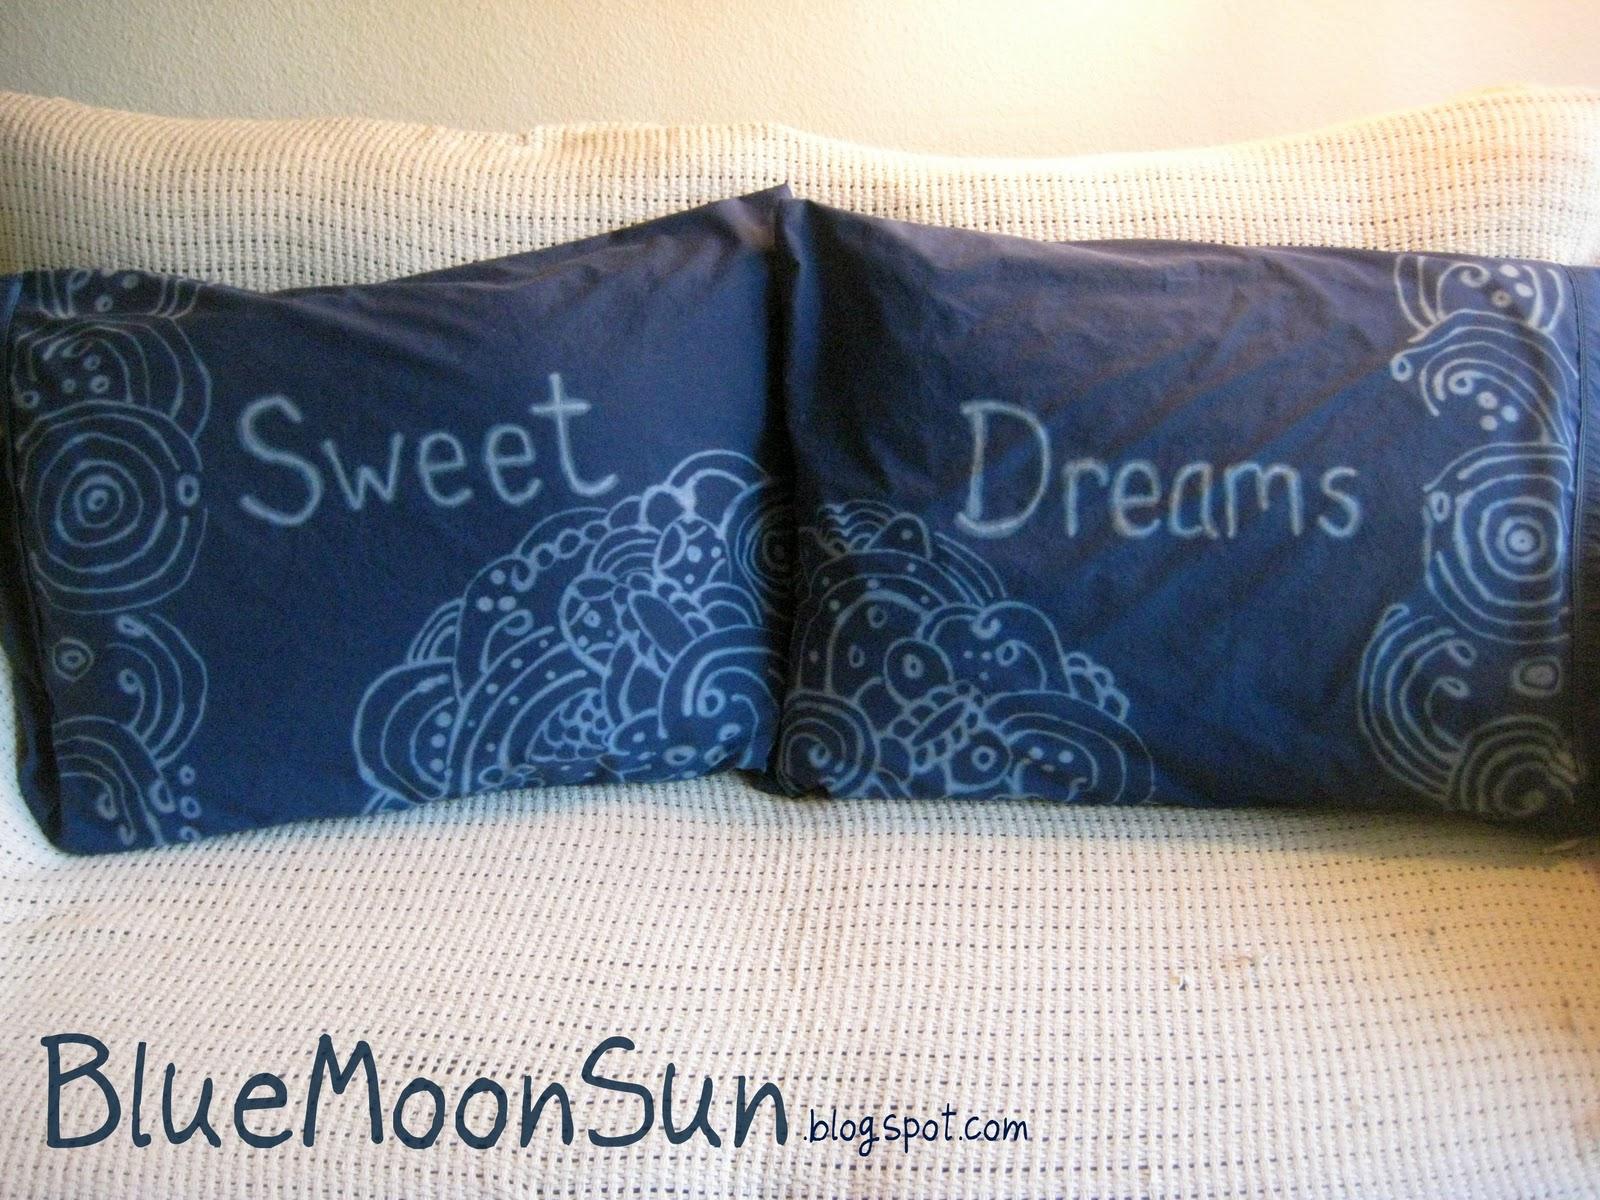 Blue Moon Sun Quot Sweet Dreams Quot Bleach Pen Pillowcase Tutorial